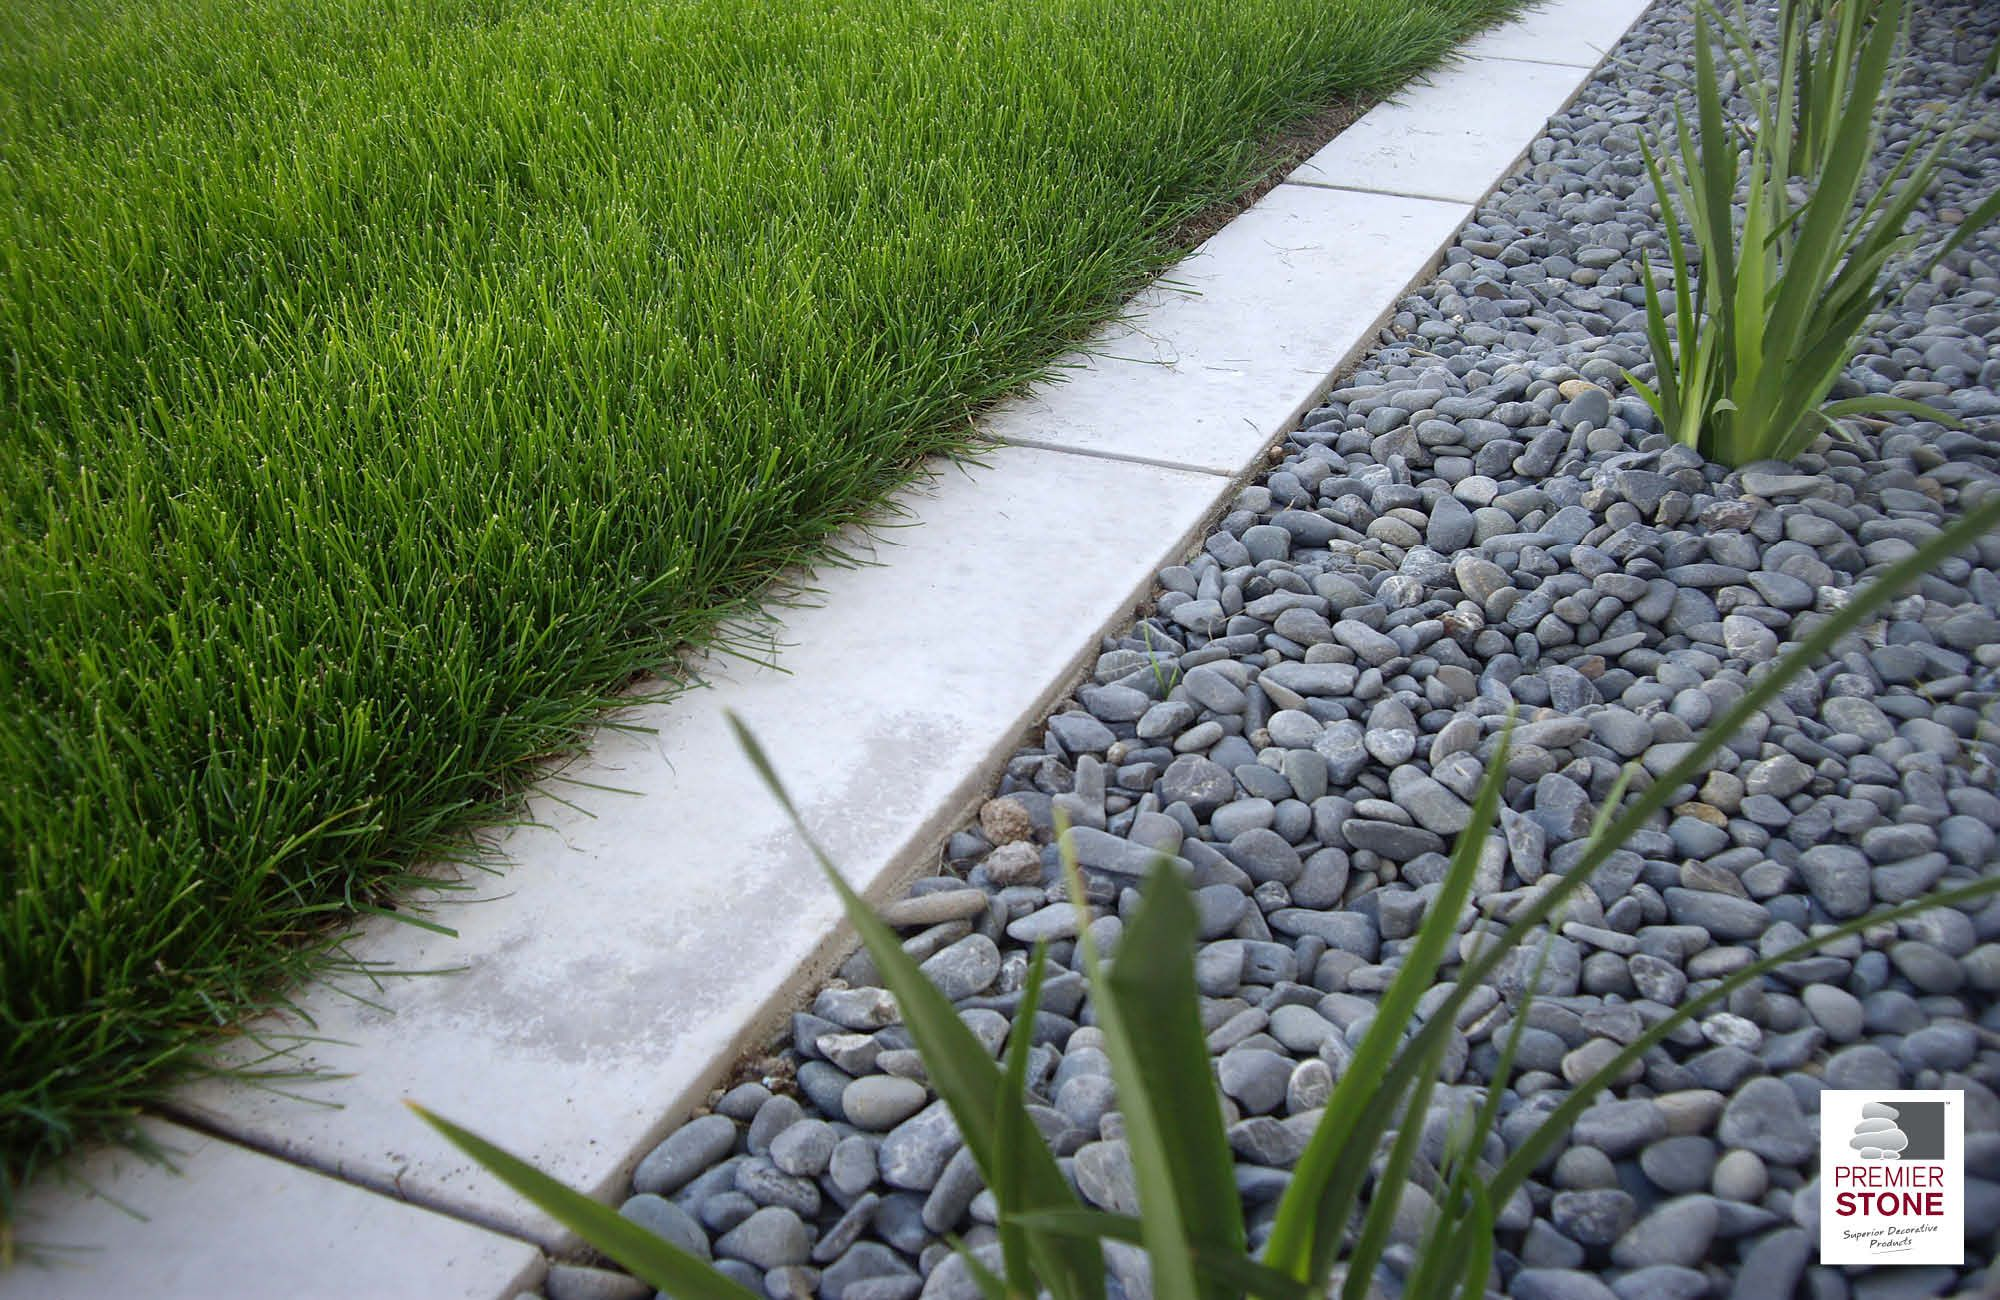 Pgi Decorative Stone In 2020 Concrete Garden Edging Diy Landscaping Landscape Curbing